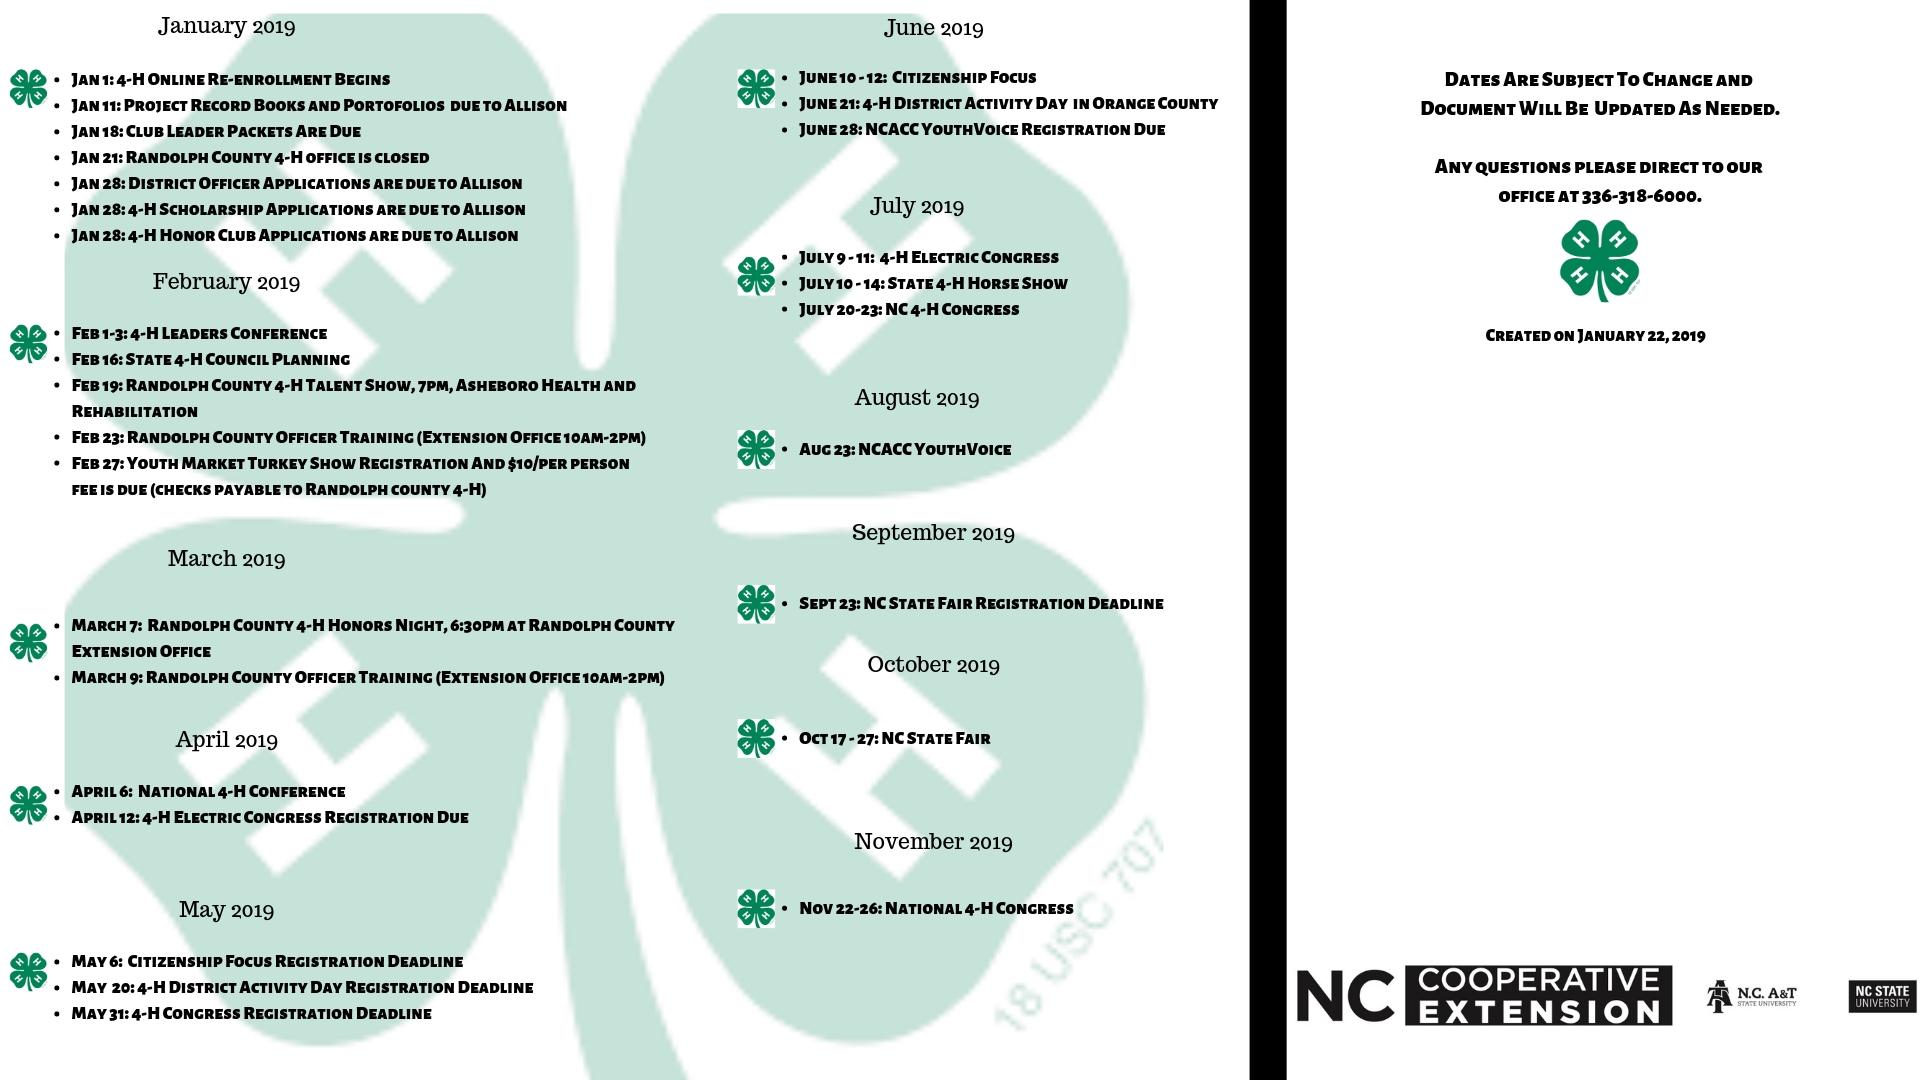 Ncsu 2019 Calendar 2019 Randolph County 4 H Events Calendar | North Carolina